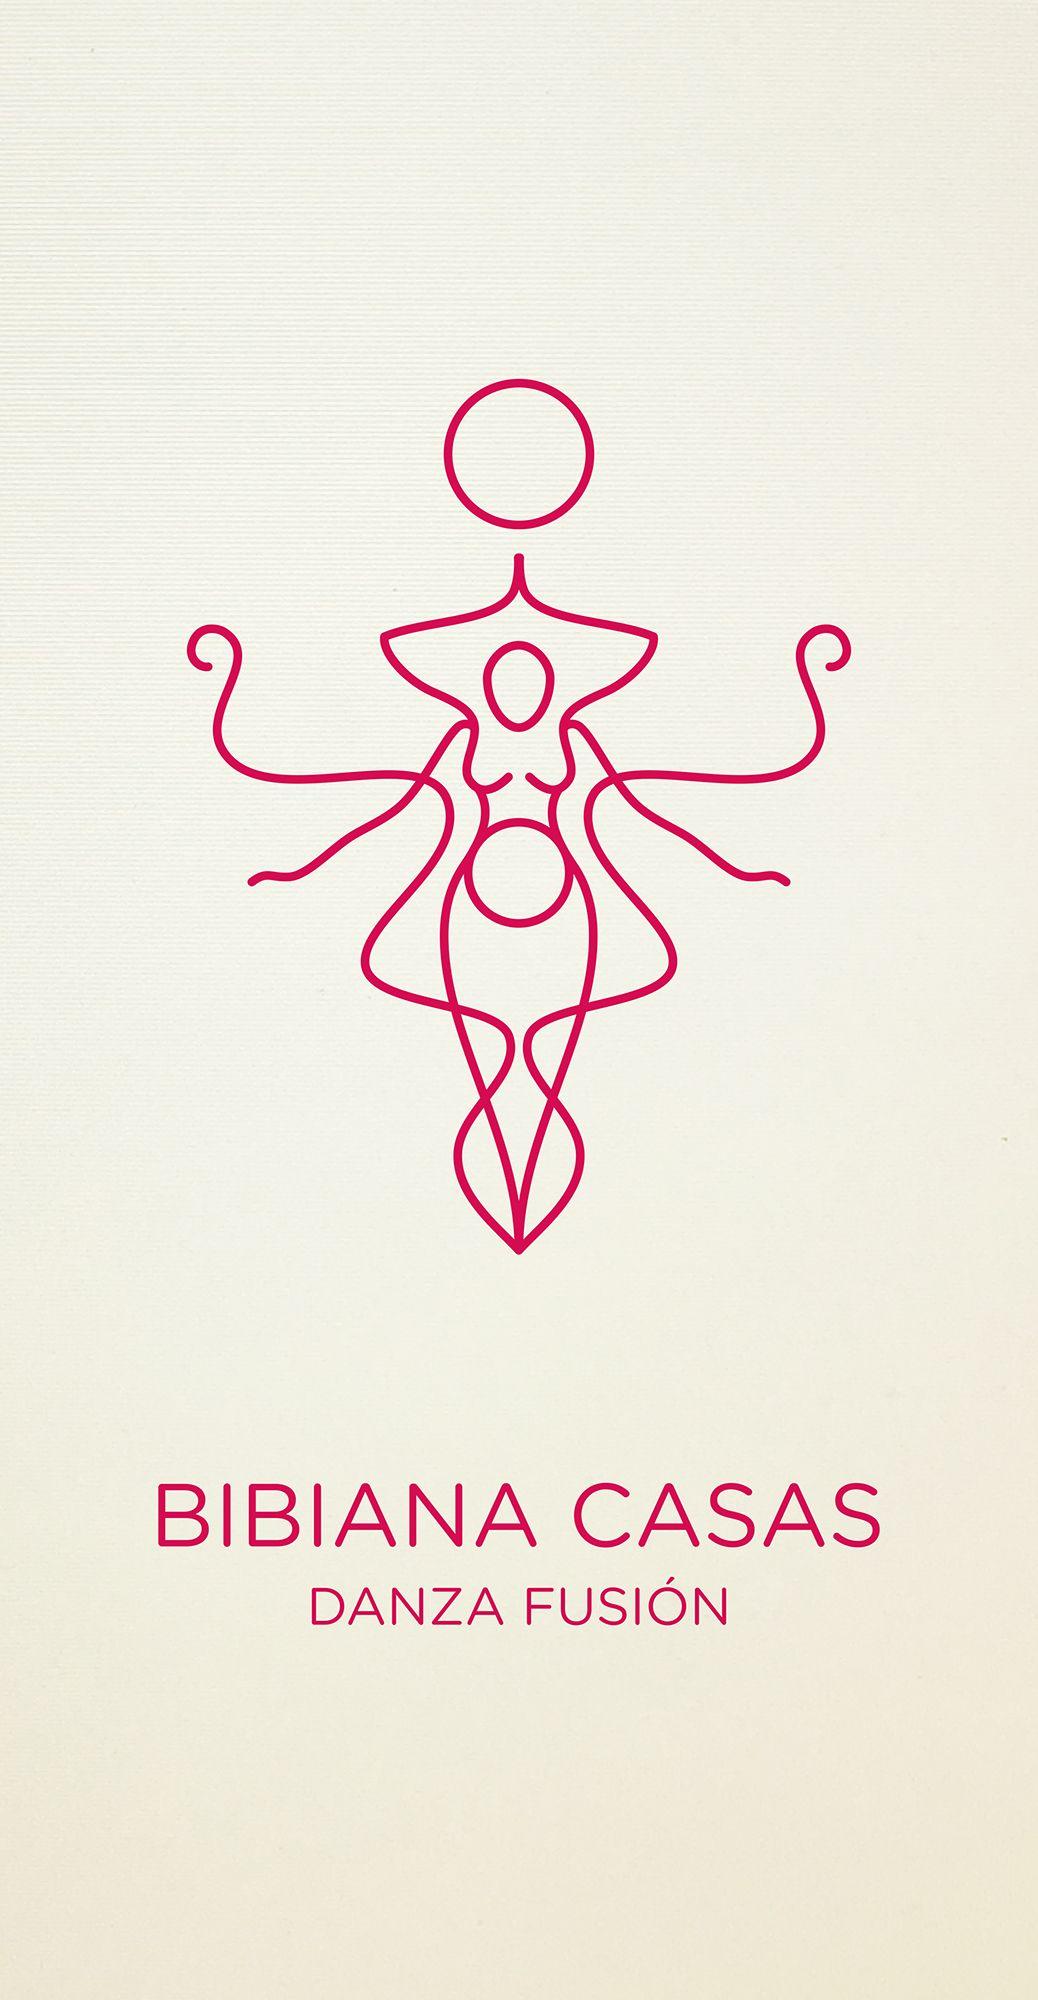 Logo Bibiana Casas - Fusion Dance, by Quatreeles